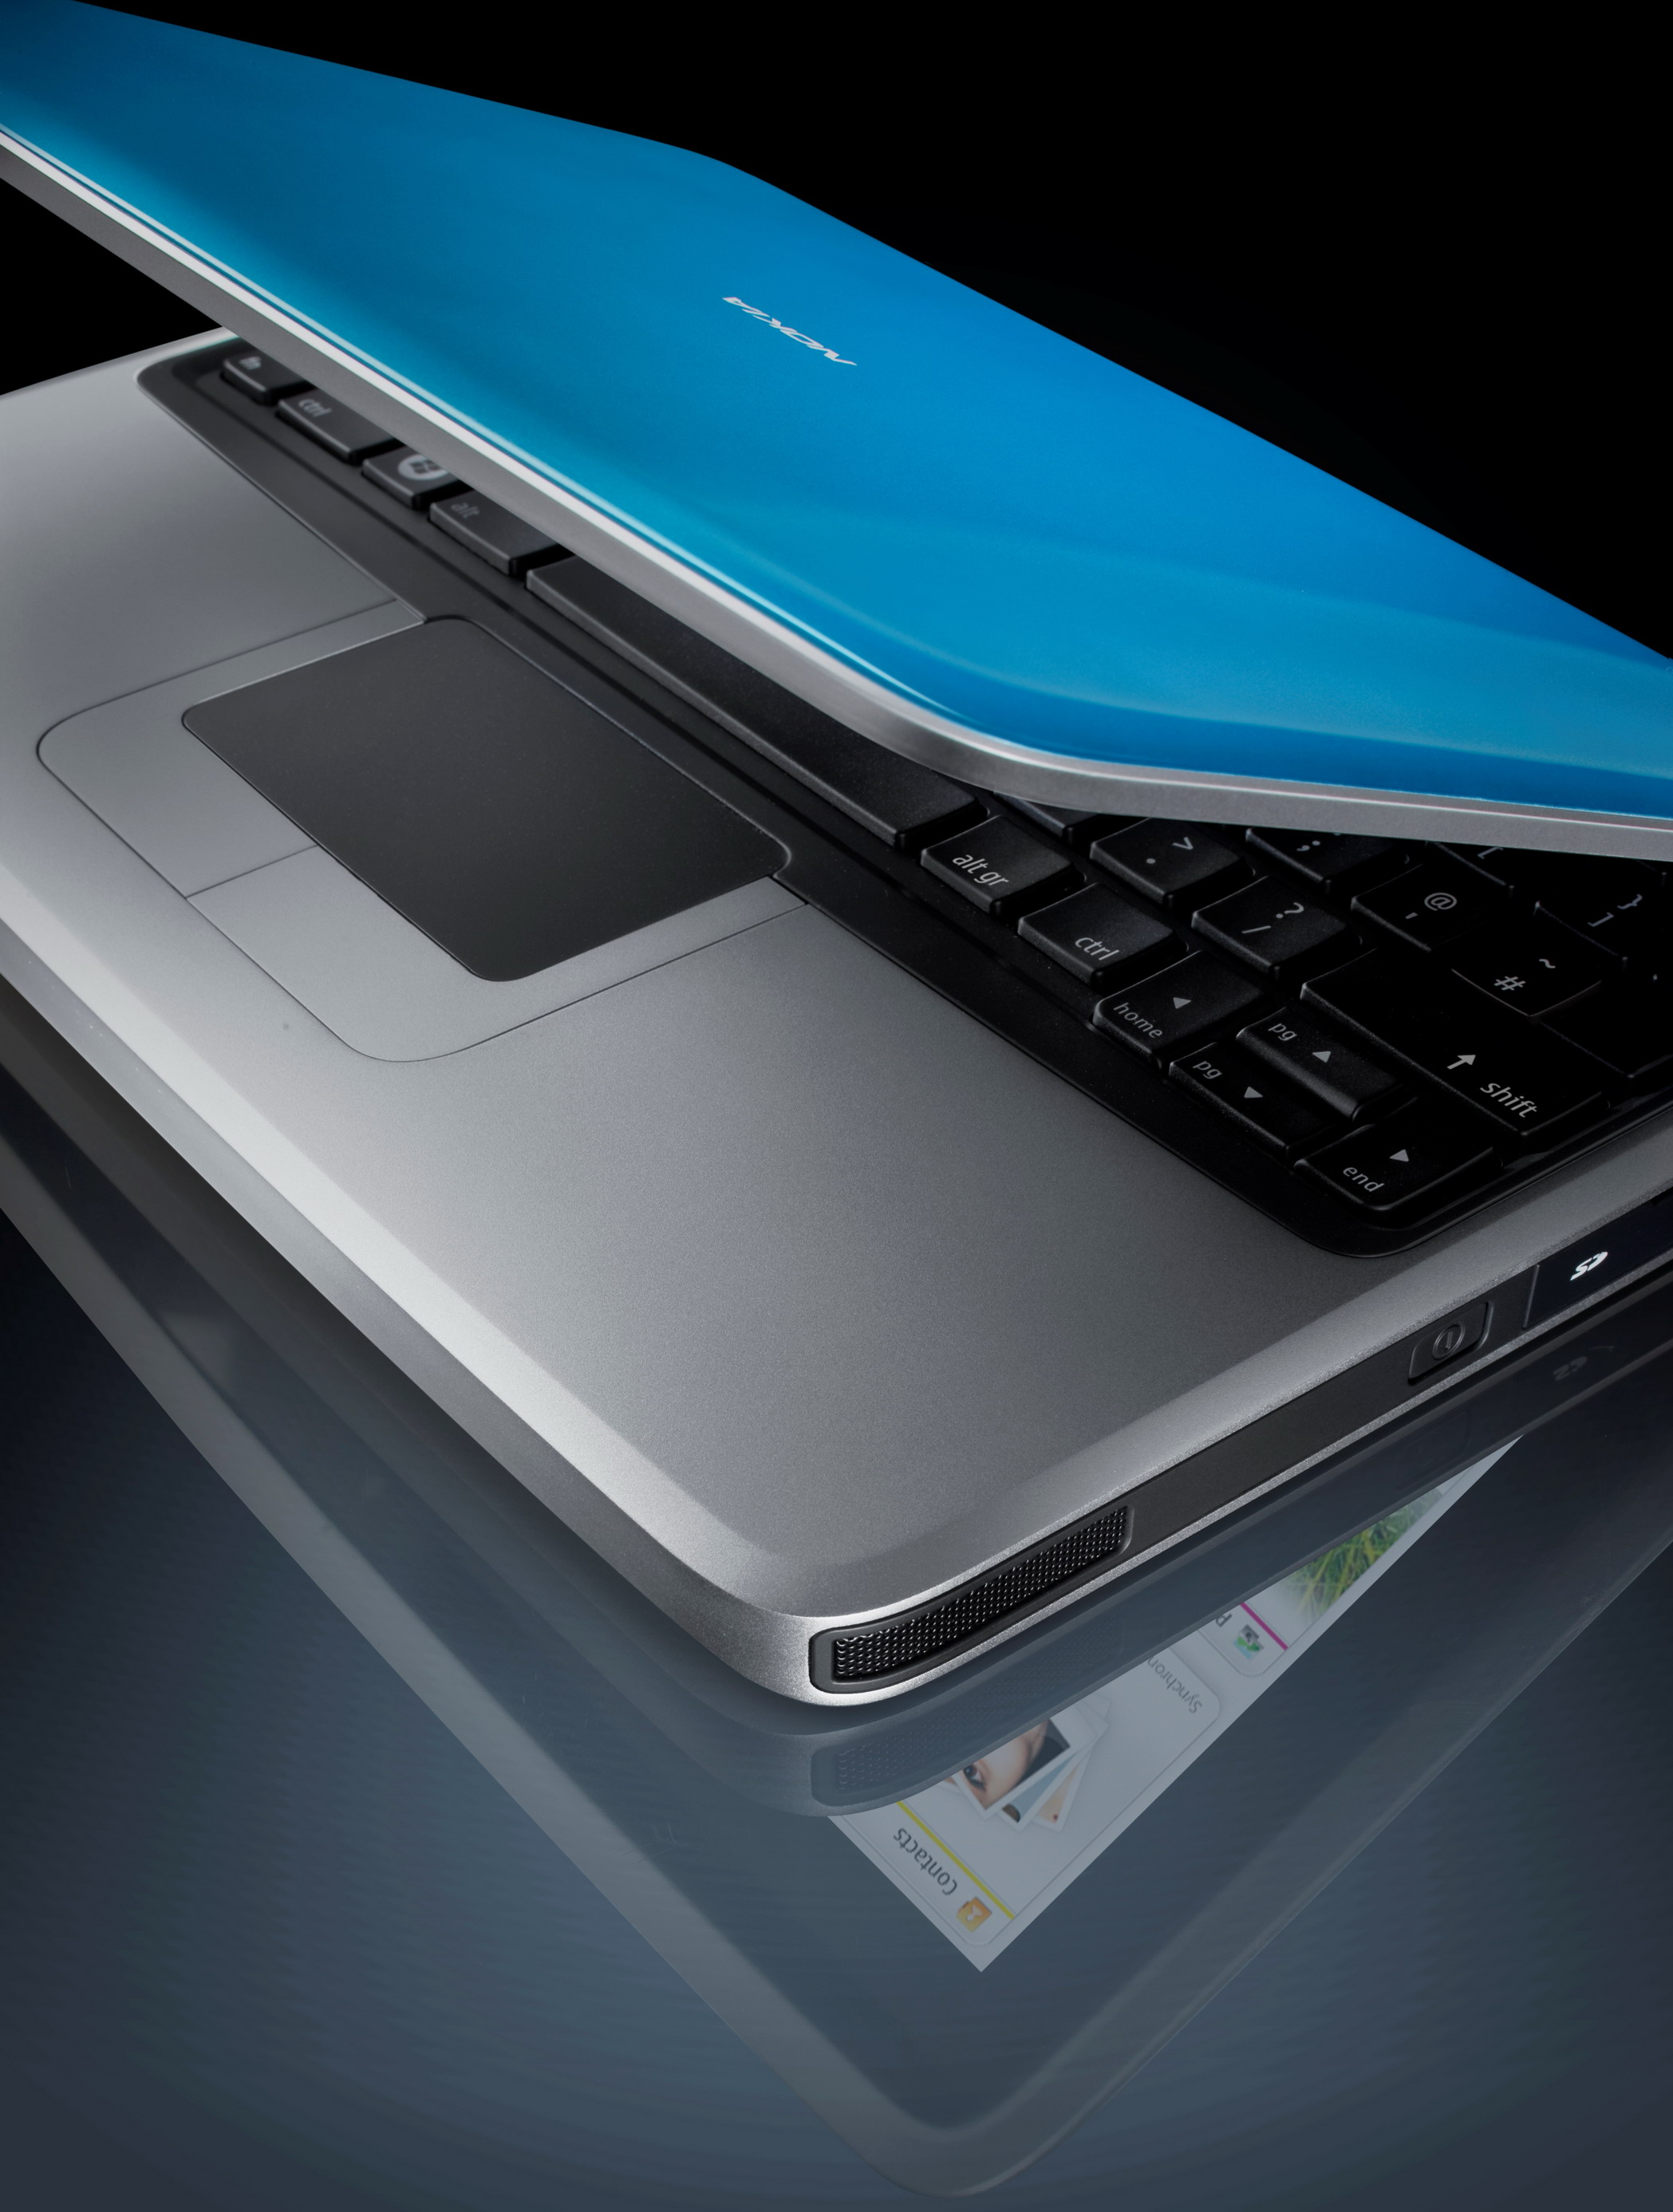 Nokia Booklet 3G包括3GHSPA和Wi-Fi 提供消費者高速上網.jpg